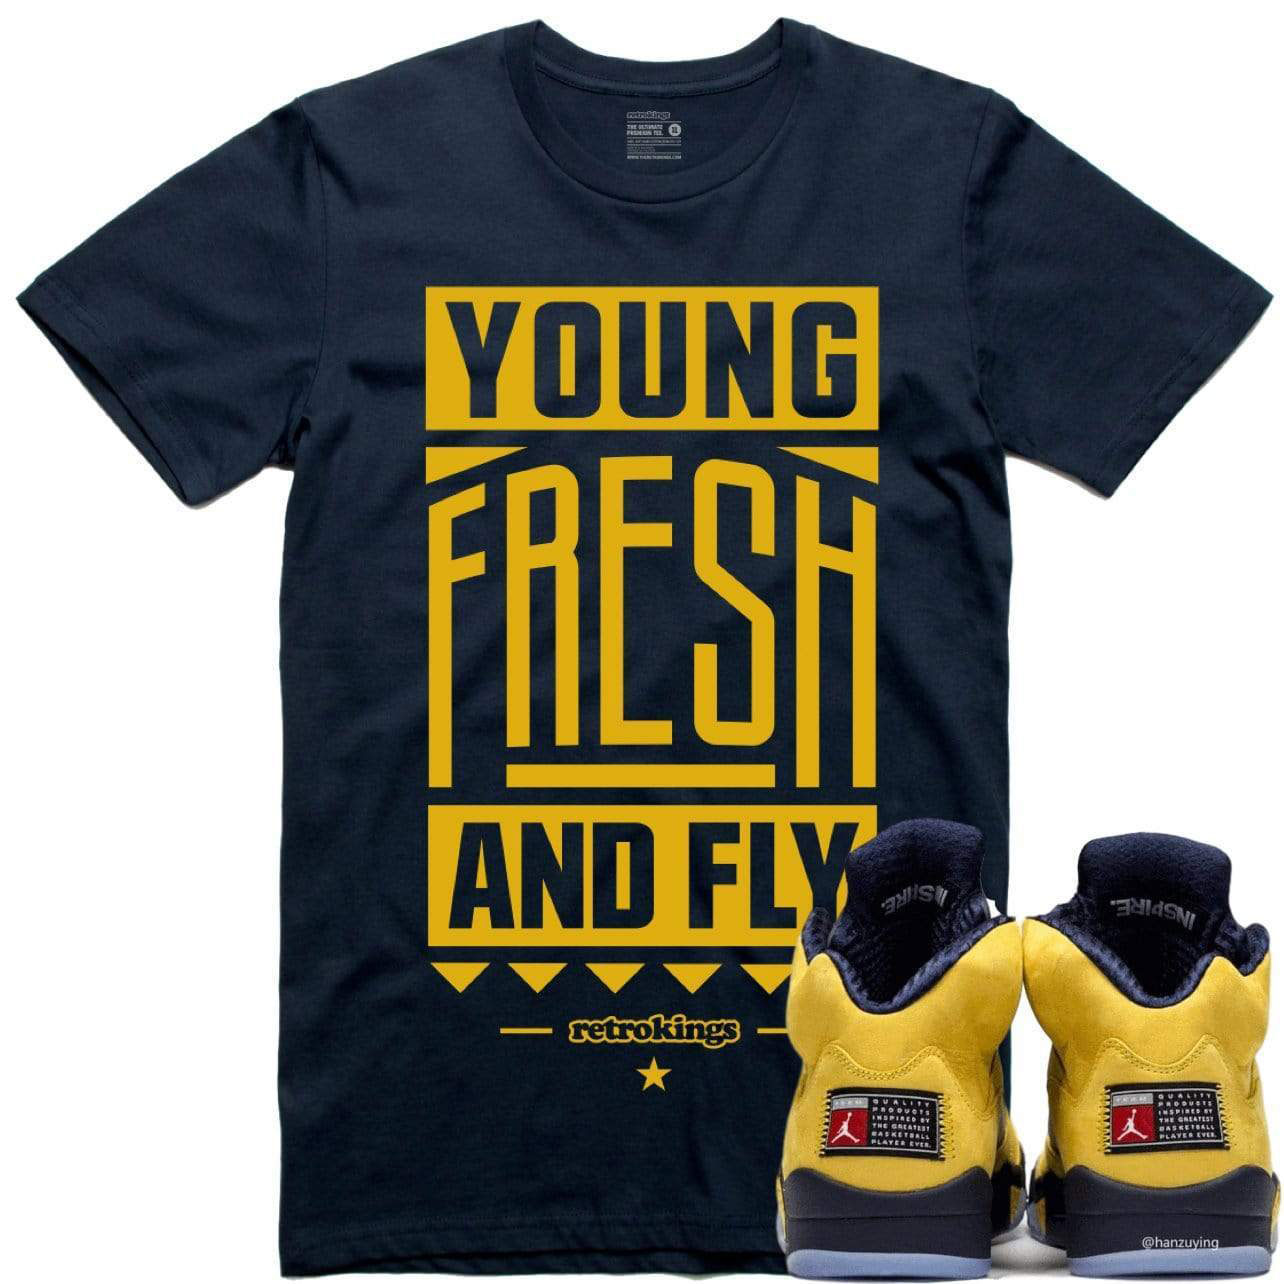 jordan-5-michigan-amarillo-sneaker-tee-shirt-6